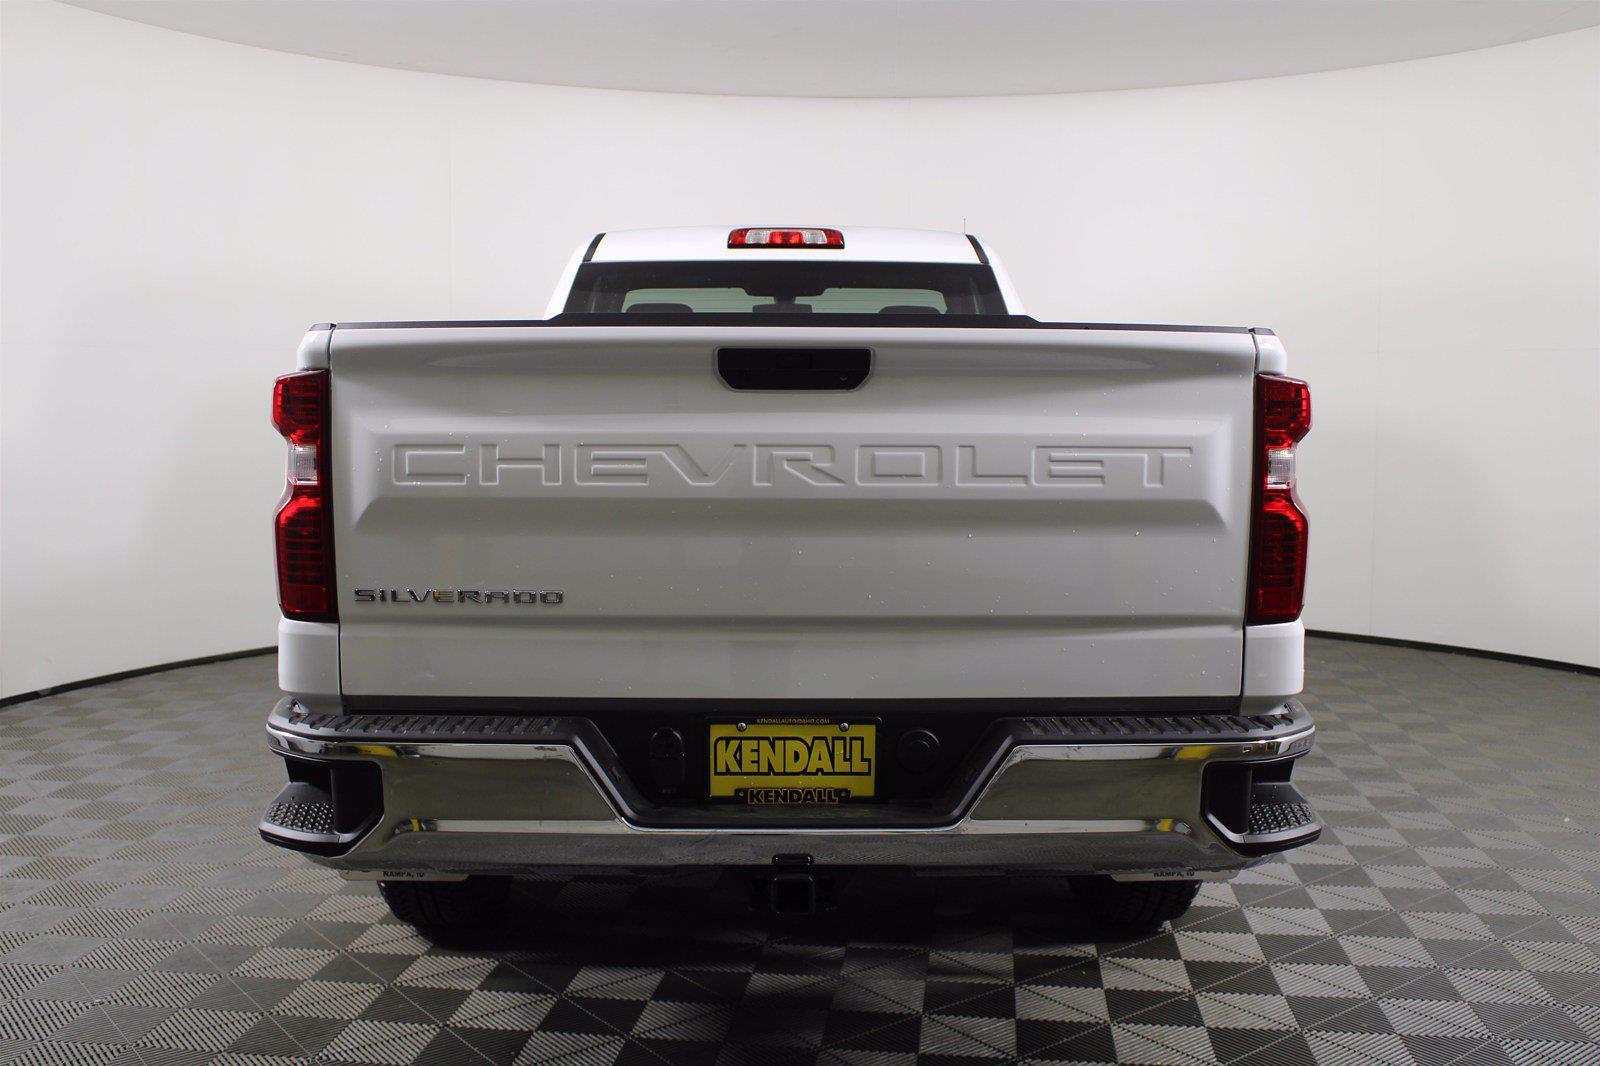 2021 Chevrolet Silverado 1500 Regular Cab 4x2, Pickup #D111066 - photo 8